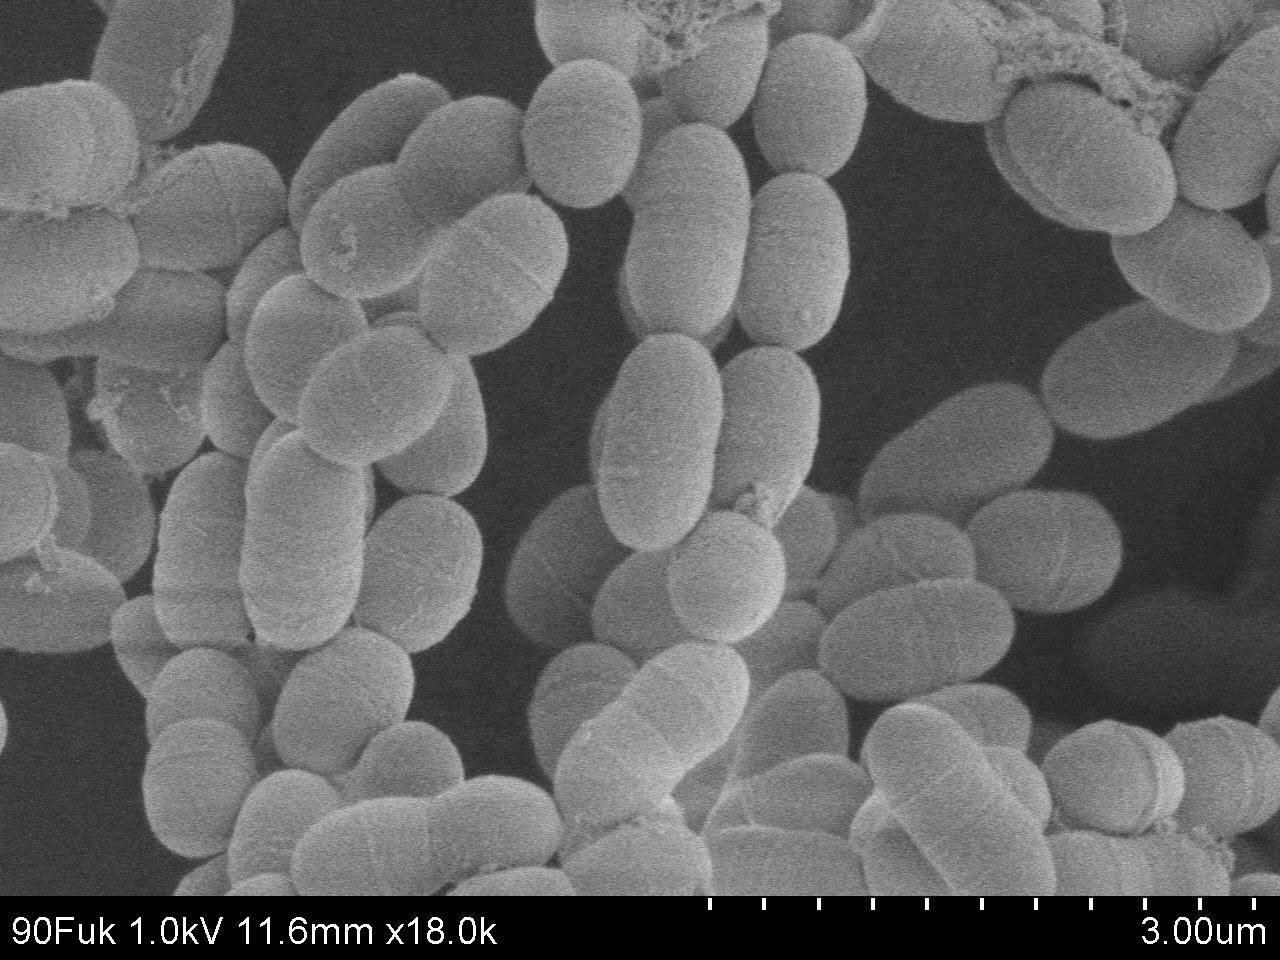 Lactococcus-lactis-harakteristika